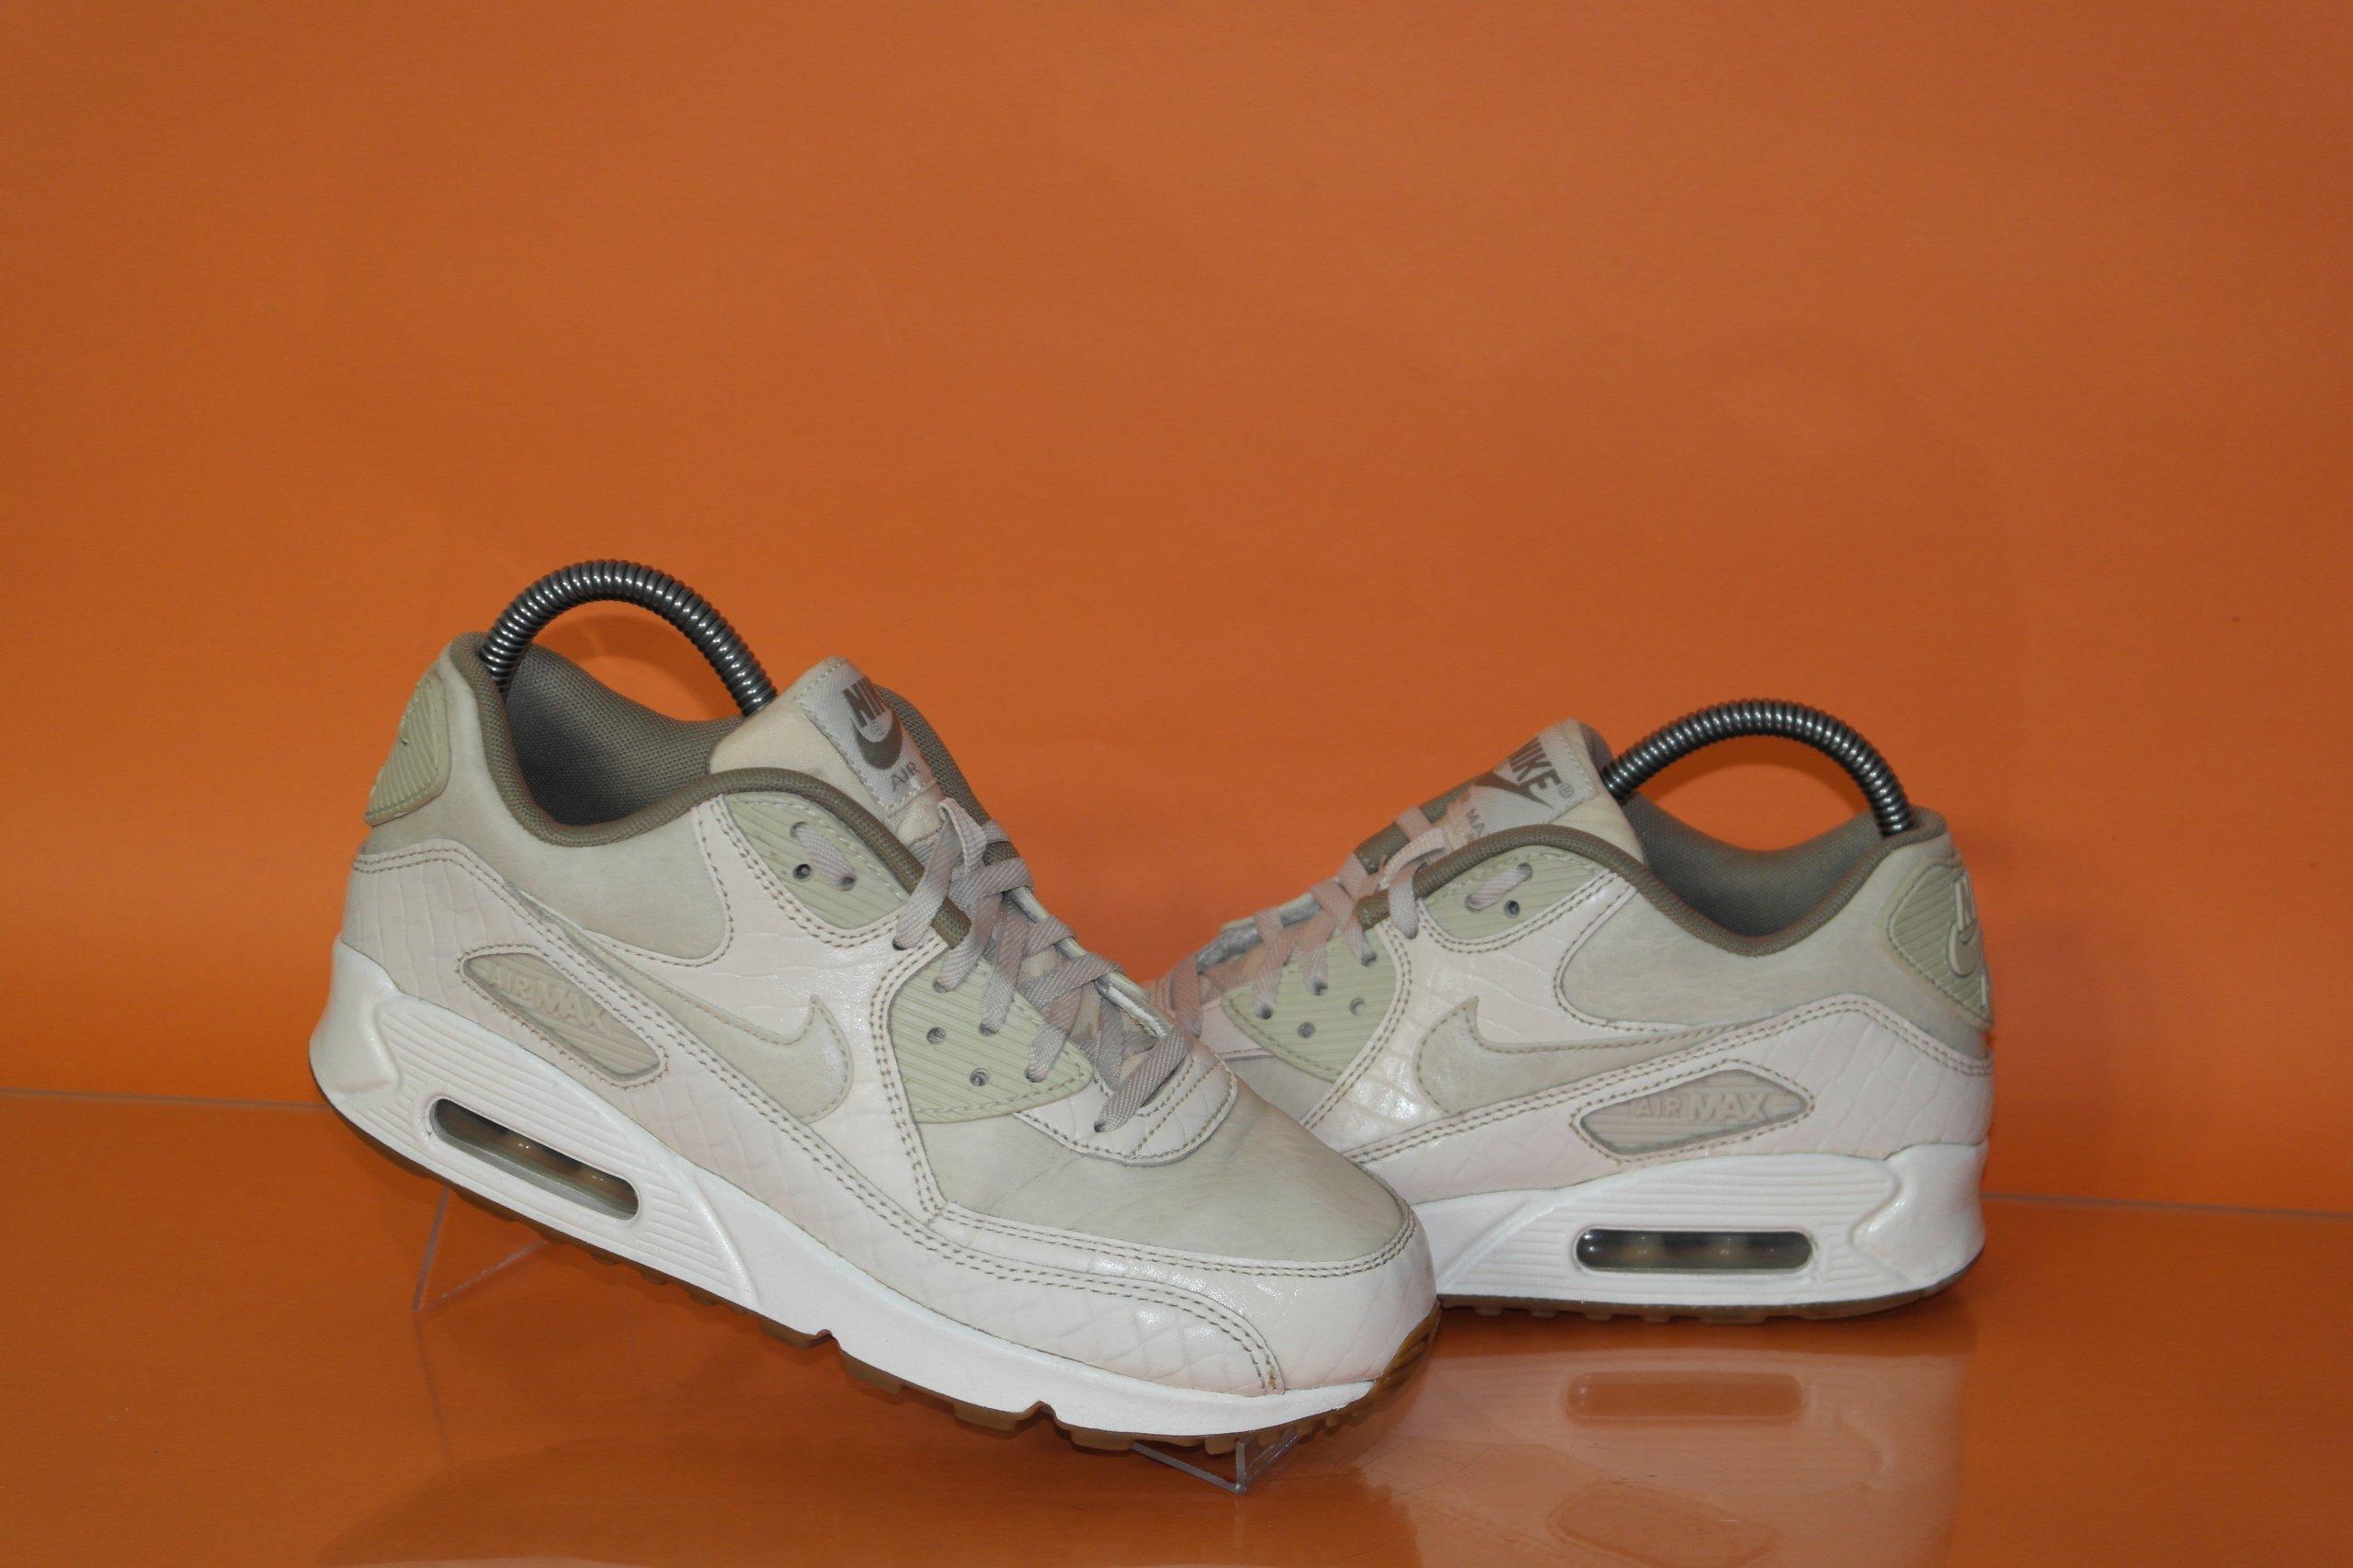 Nike Air Max 90 Essential buty sportowe (38,5)